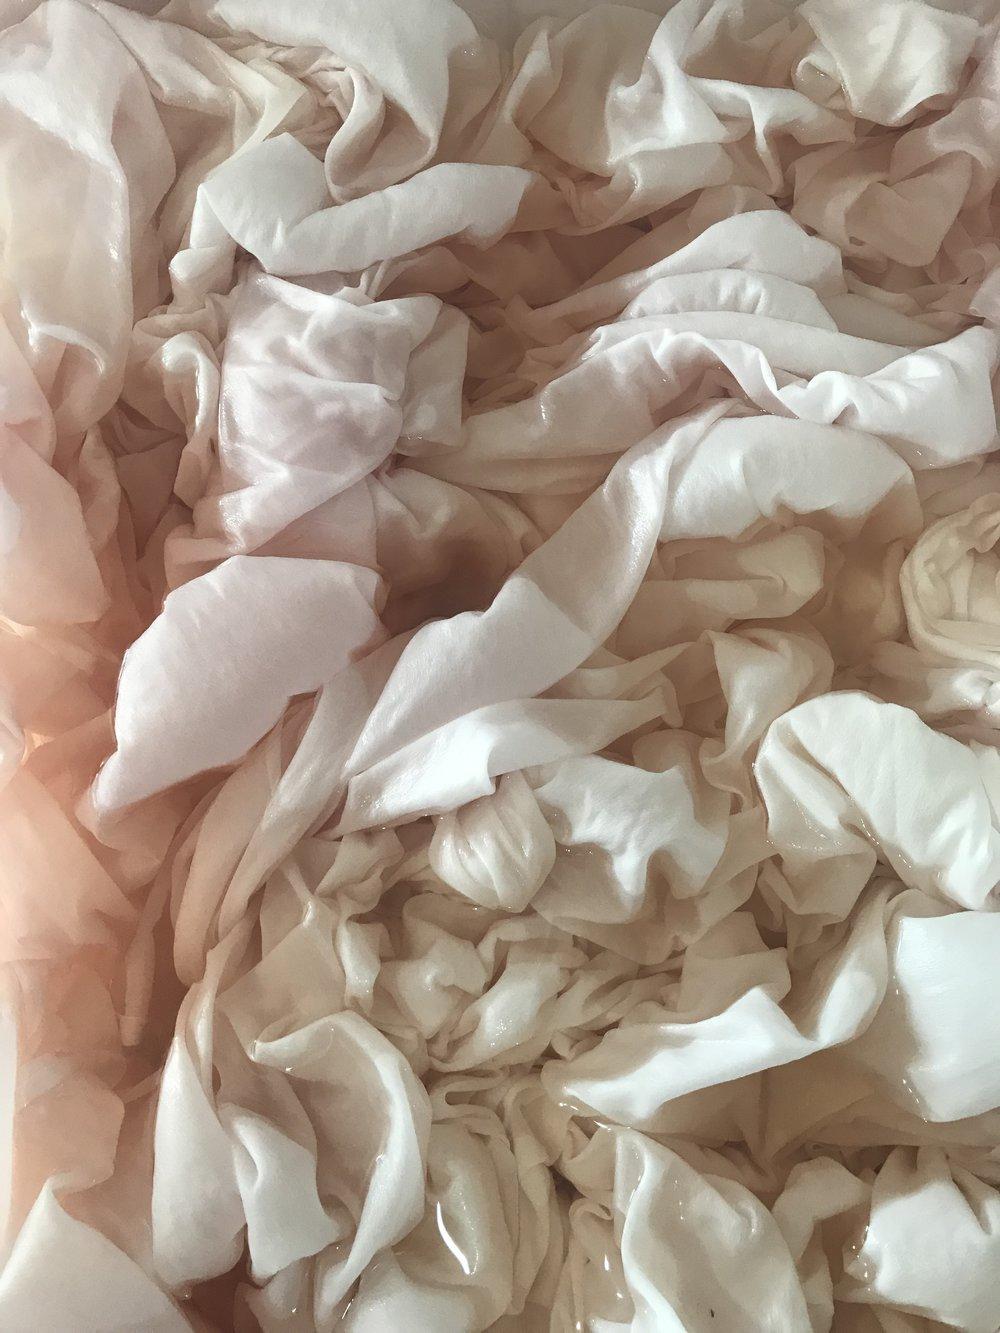 the silk satin, in the dye bath